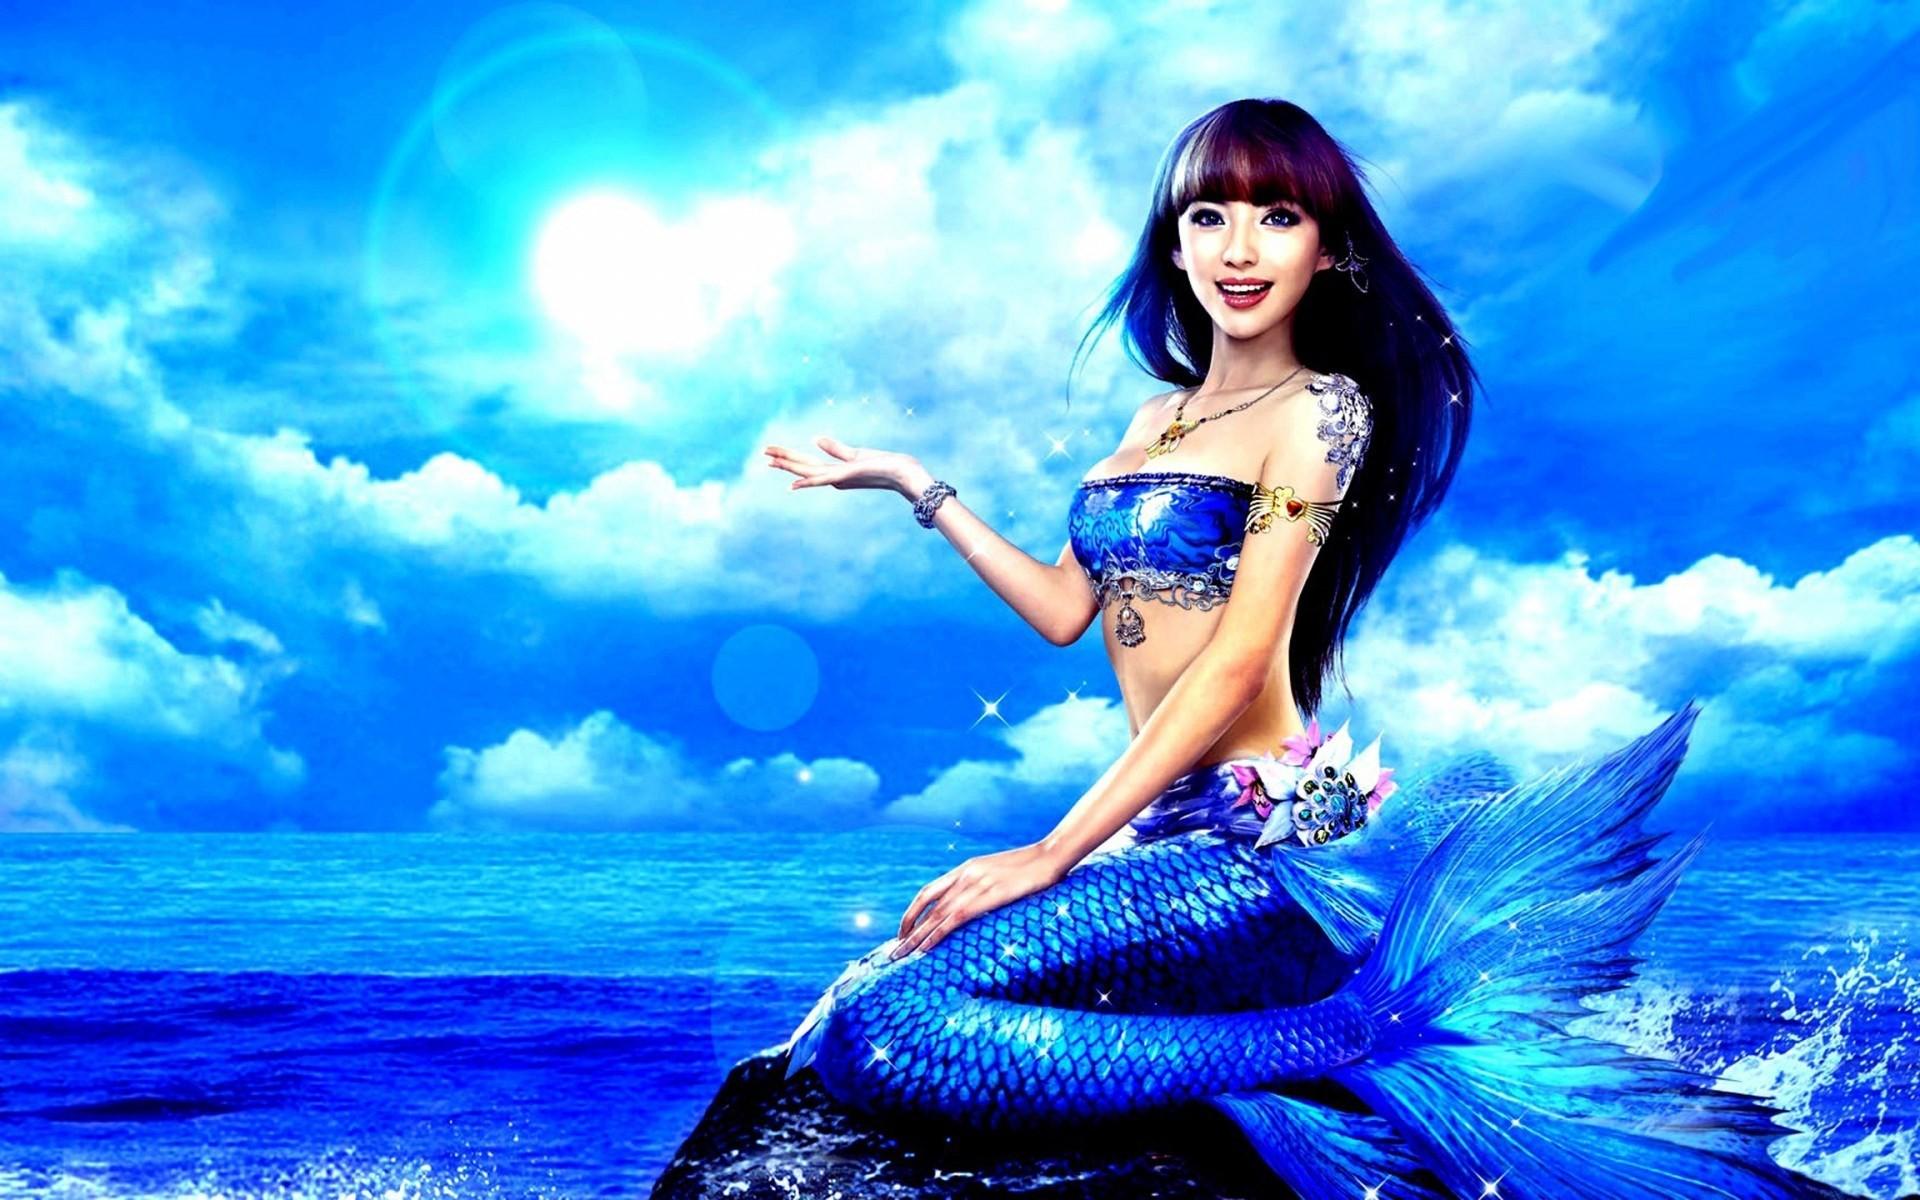 px Full size mermaid picture by Marissa Brook for :  pocketfullofgrace.com